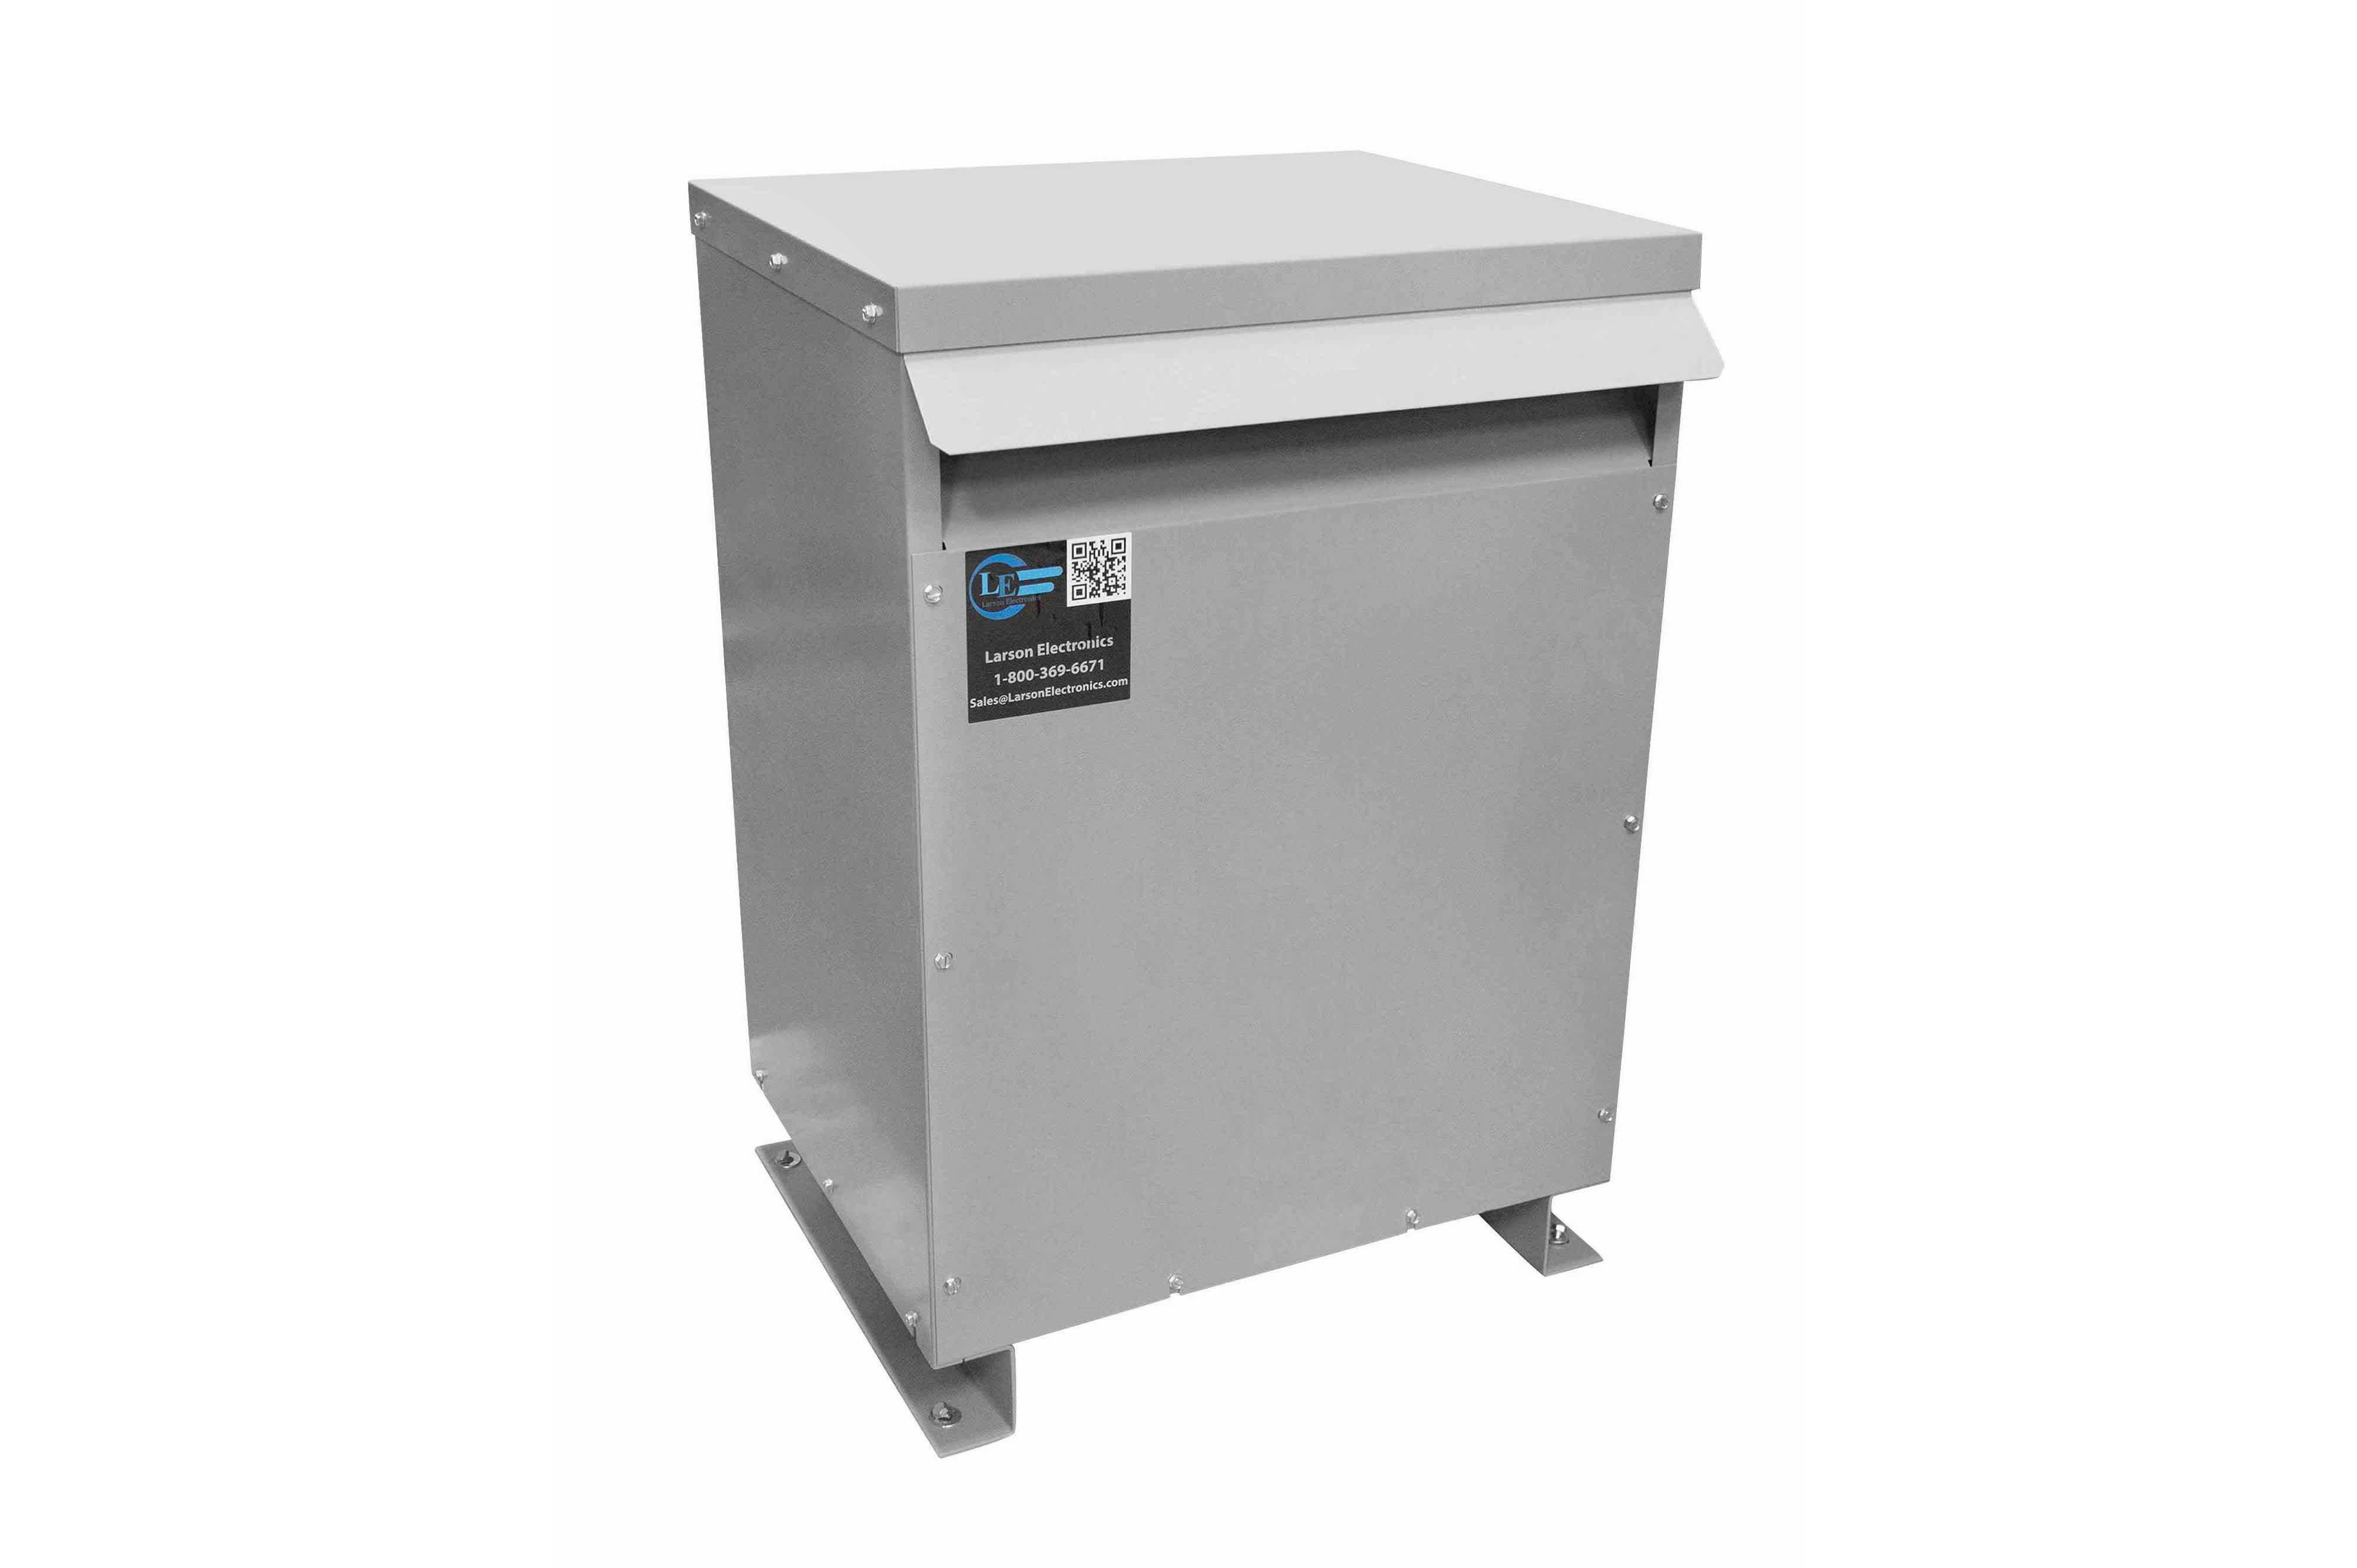 600 kVA 3PH Isolation Transformer, 575V Wye Primary, 480Y/277 Wye-N Secondary, N3R, Ventilated, 60 Hz